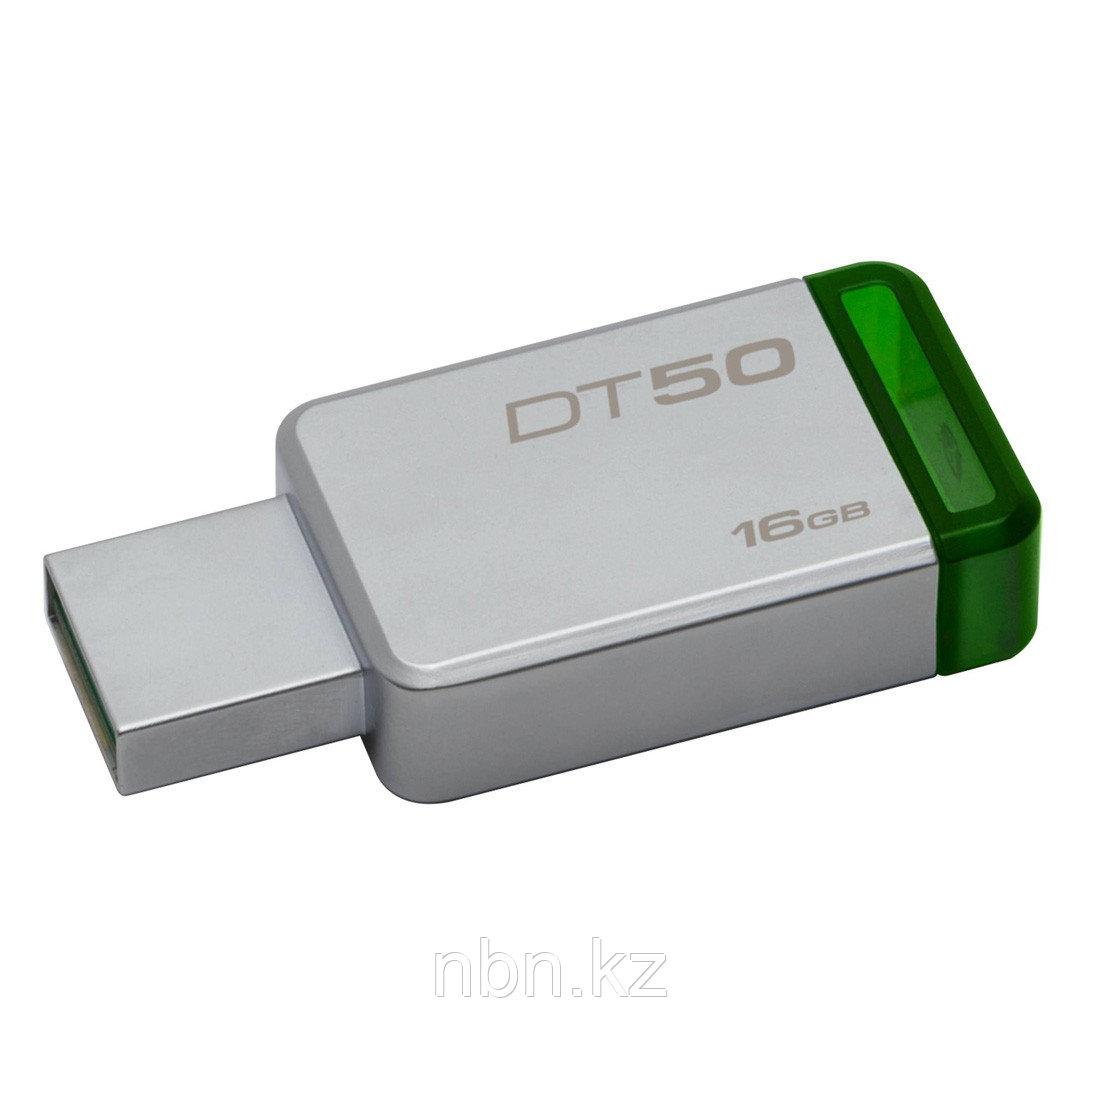 USB-накопитель Kingston DataTraveler® 50  (DT50) 16GB